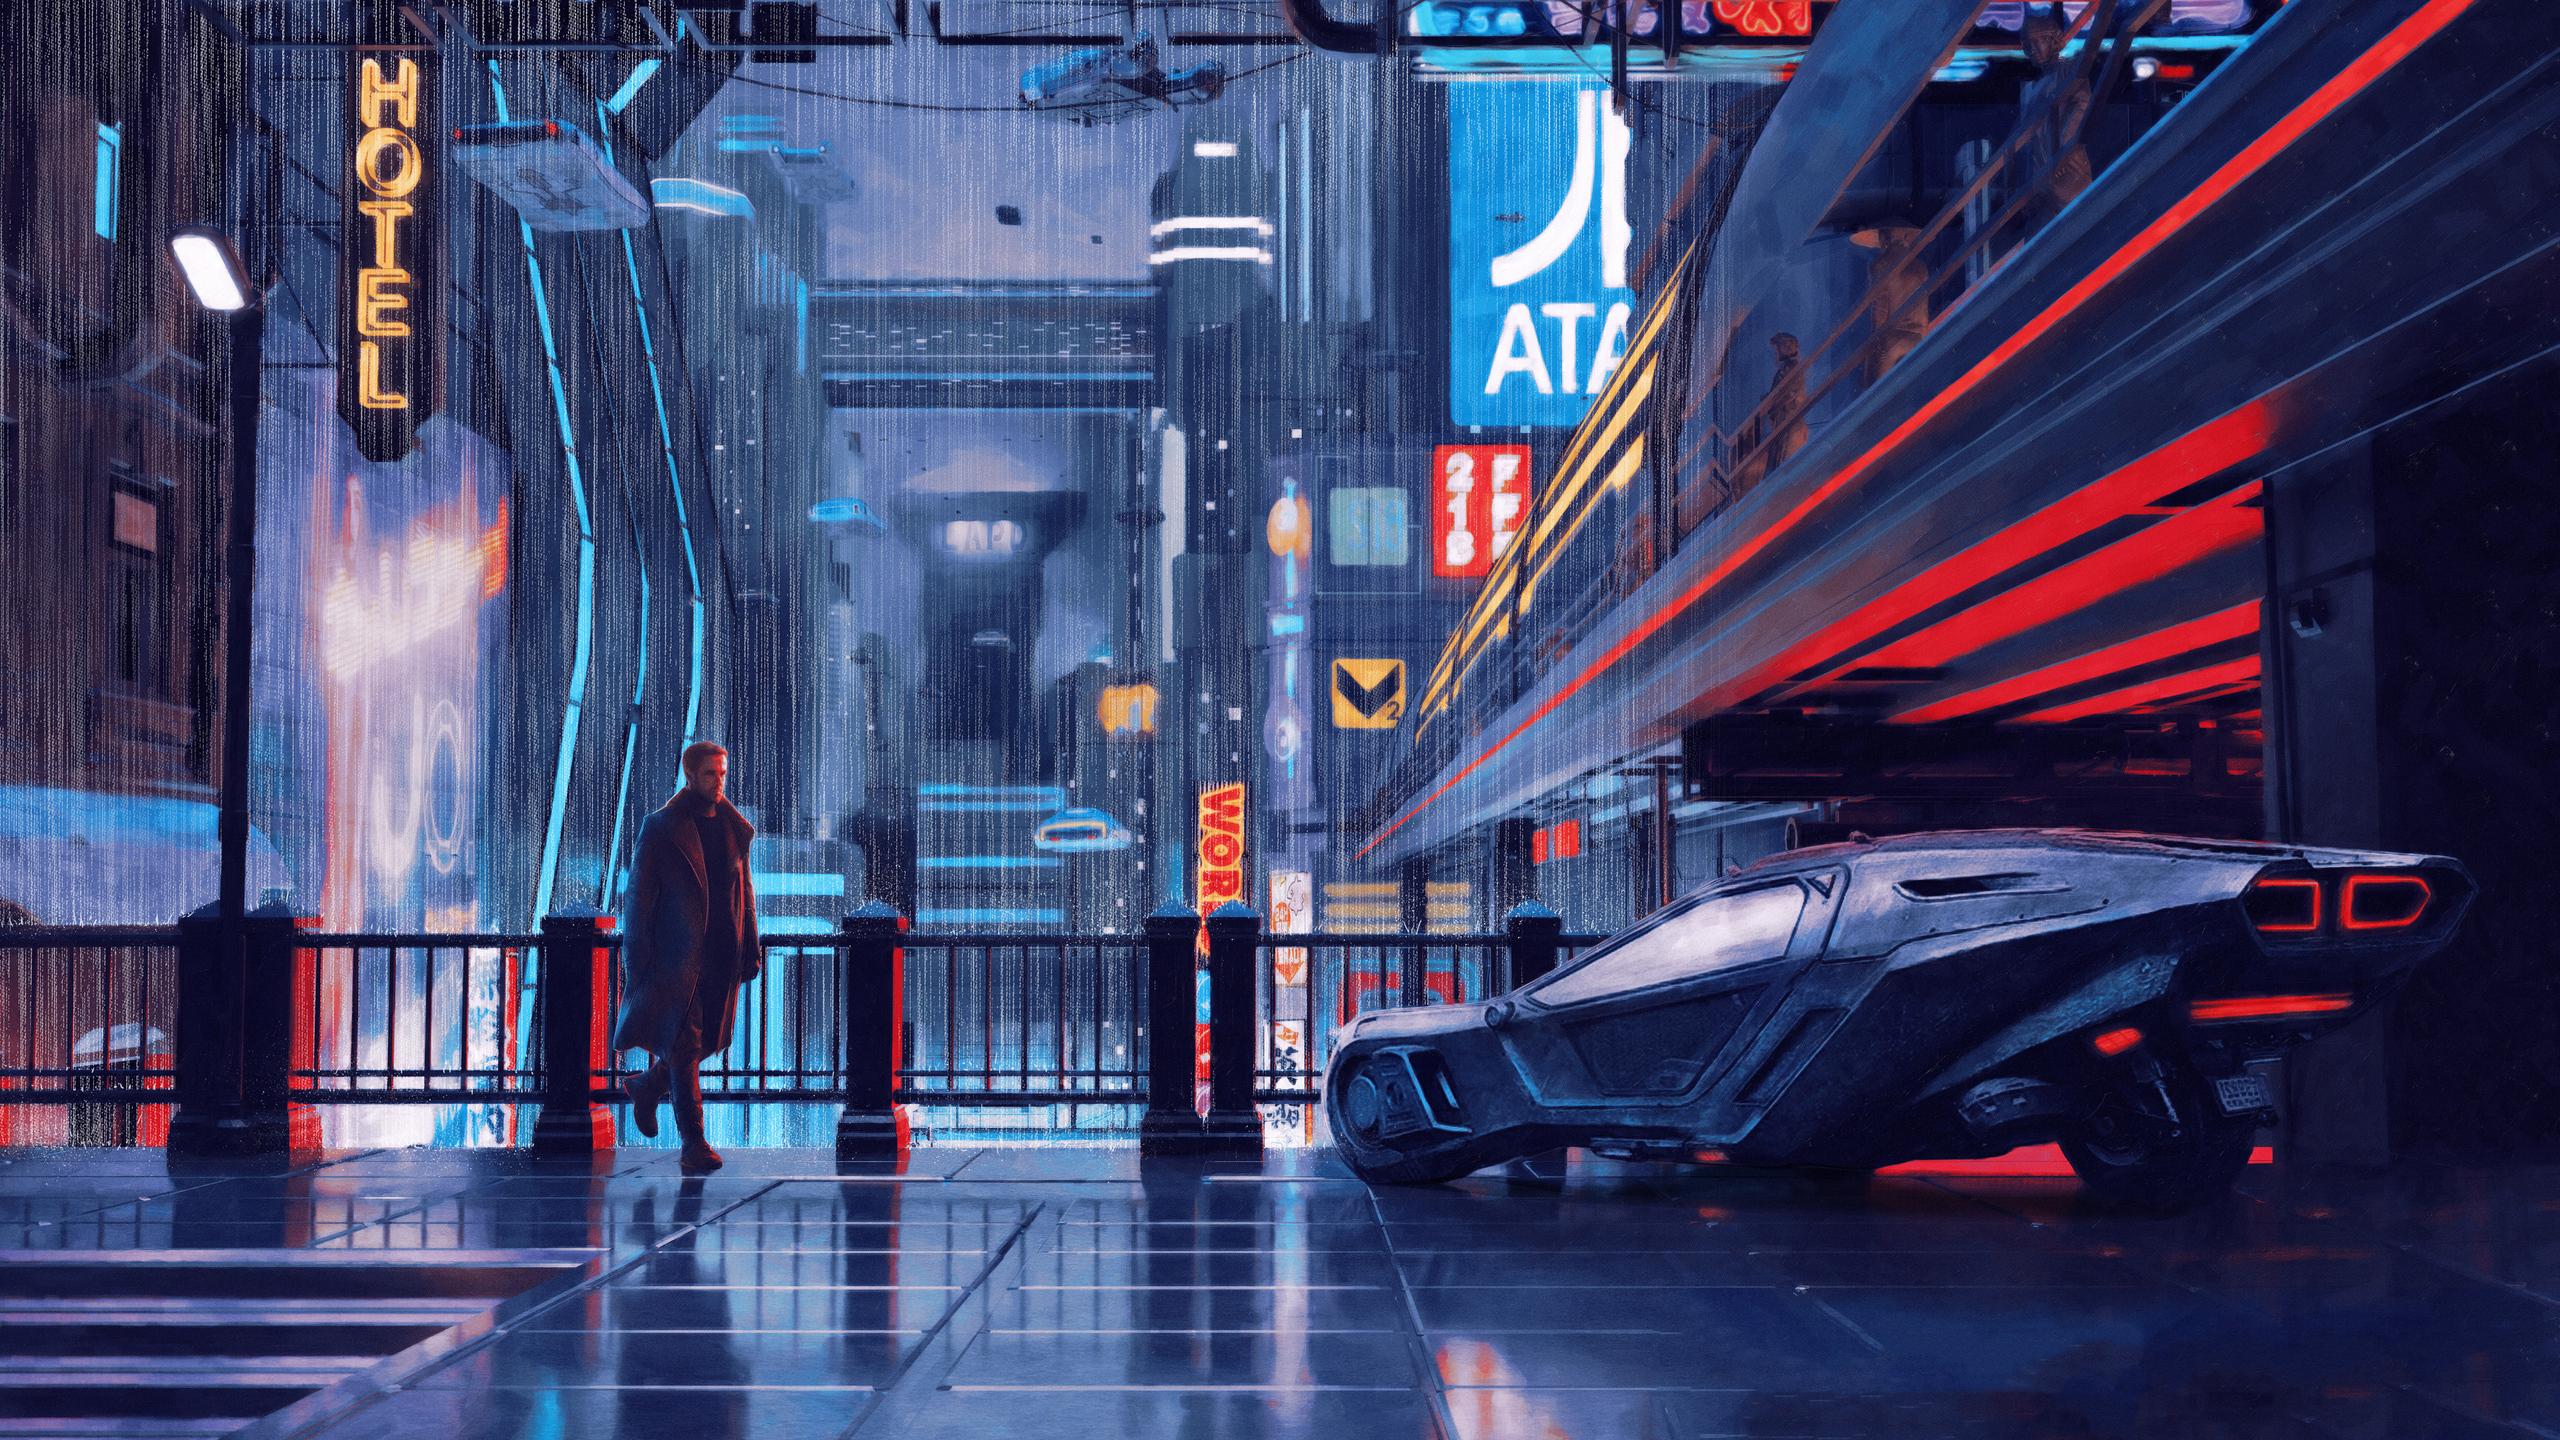 2560x1440 Blade Runner 2049 Arts 1440P Resolution HD 4k ...